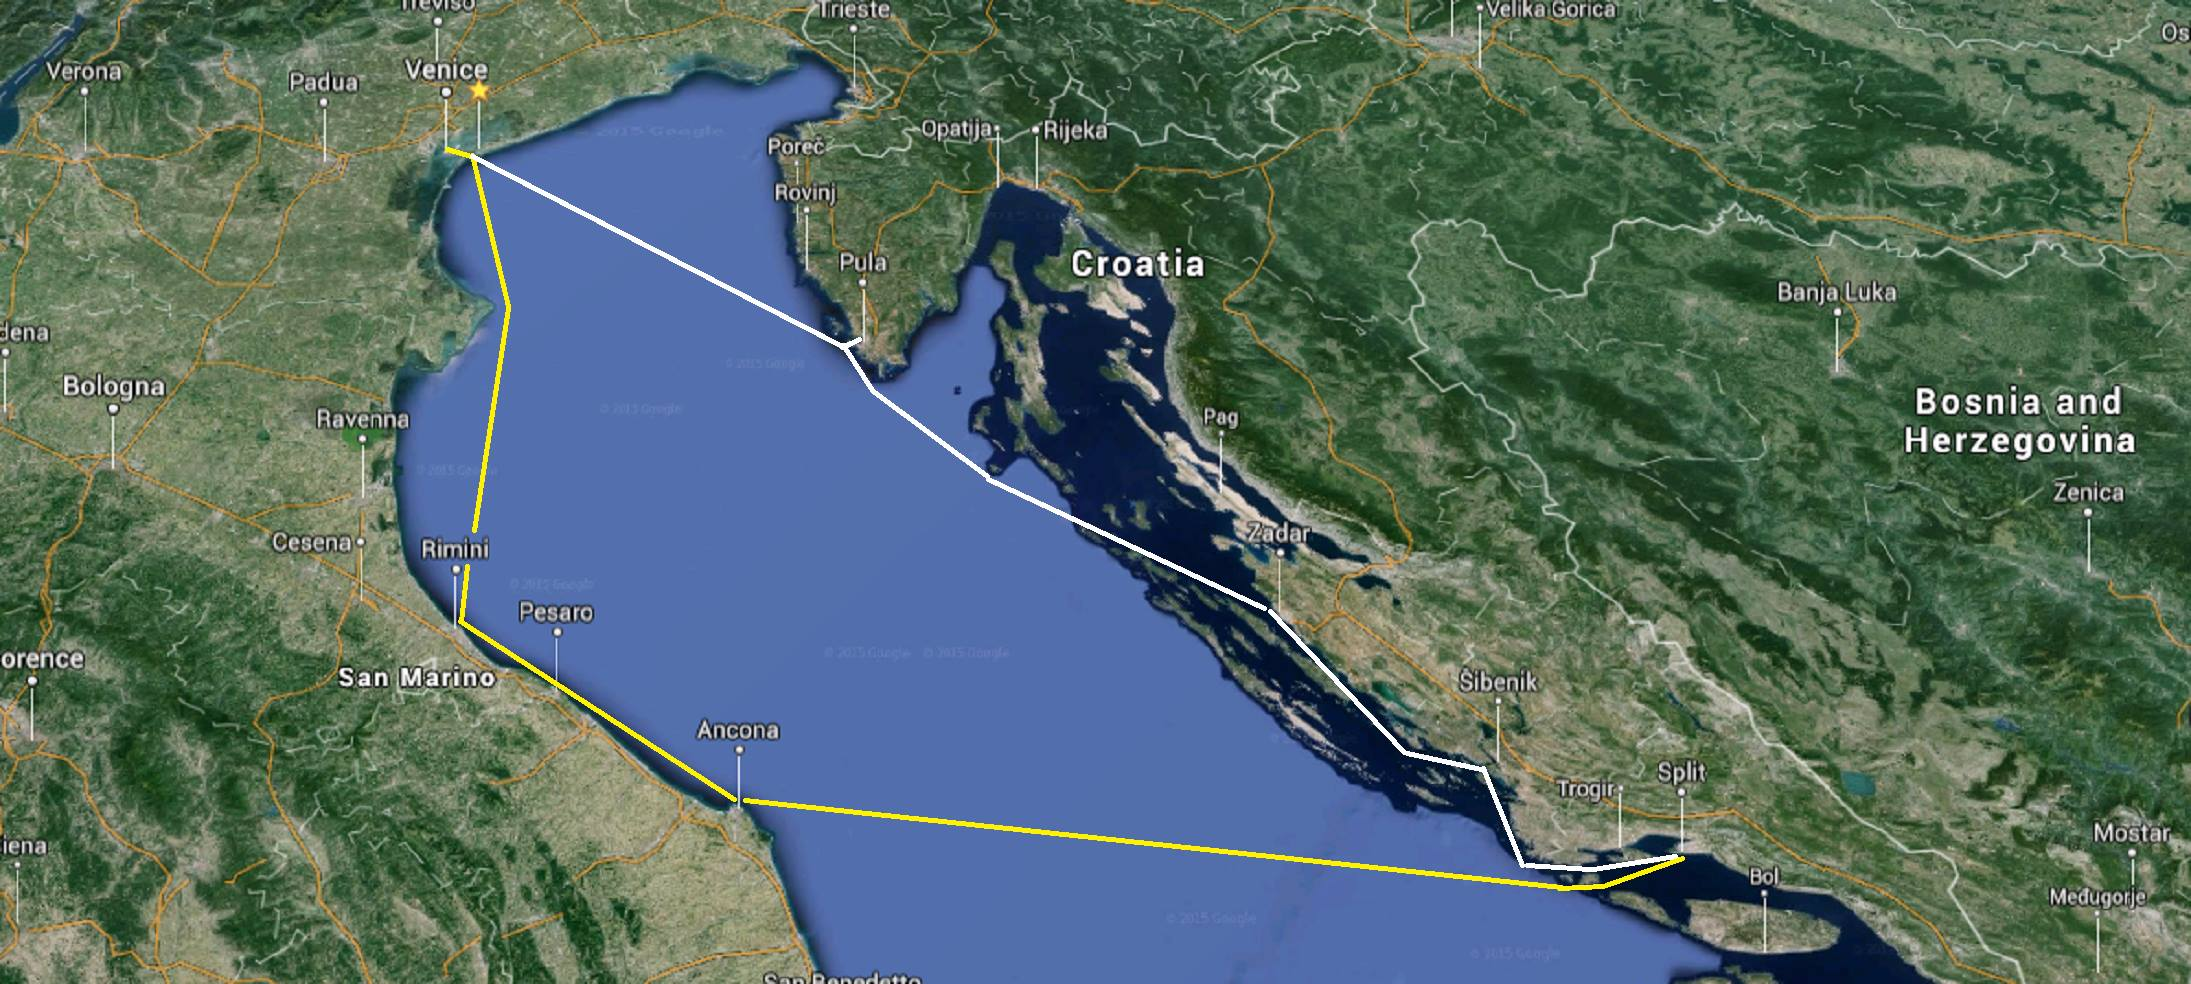 Sailing San Marino - Venice - Pula!